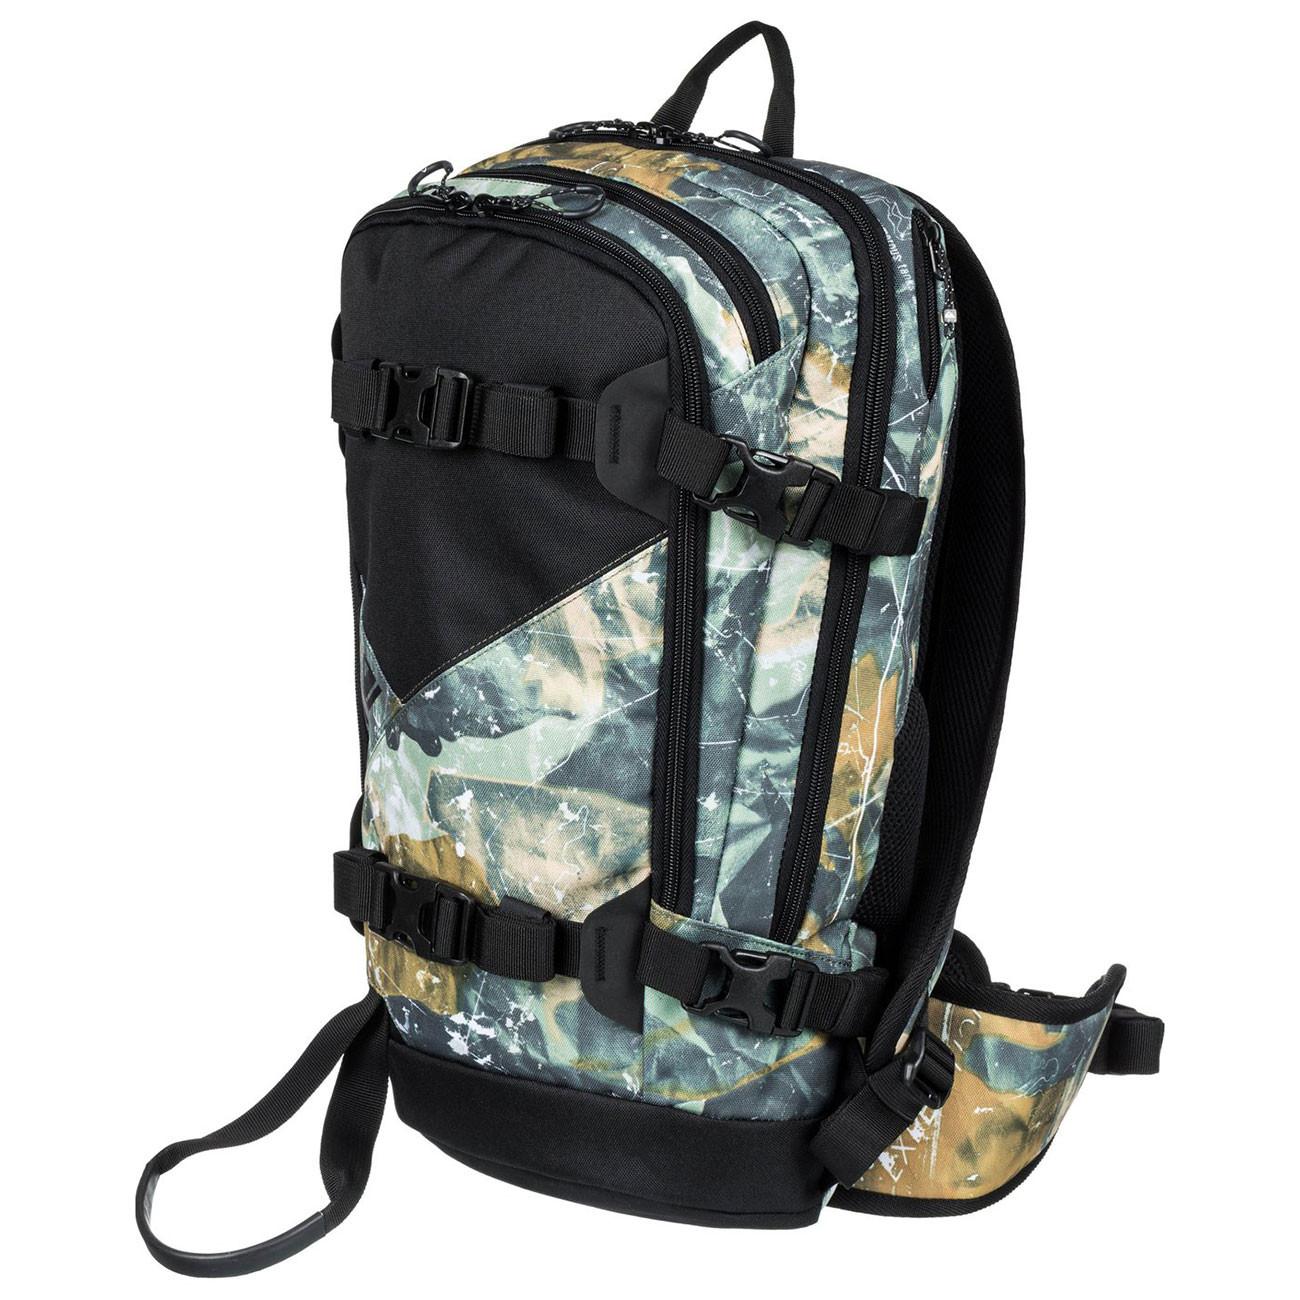 359f9686281c6 Snowboard backpack Quiksilver Oxydized 16L grape leaf tanenbaum ...